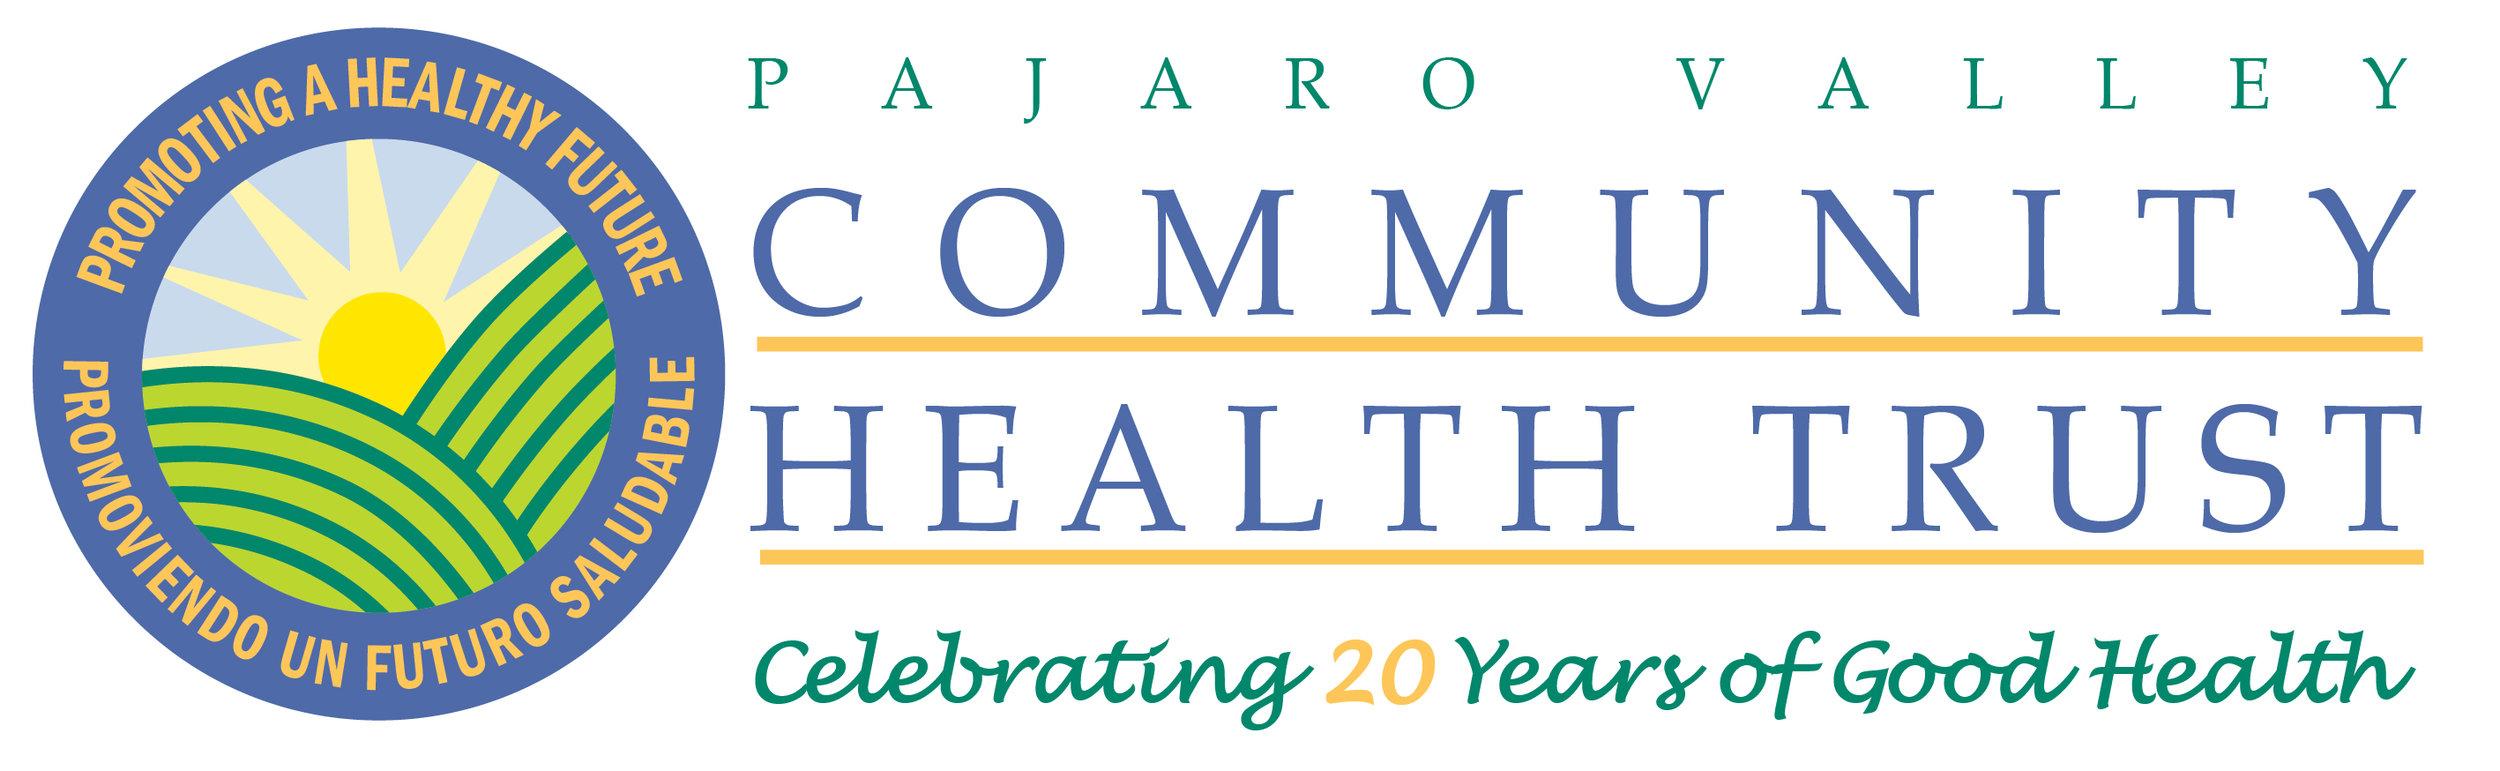 COMMUNITY HEALTH TRUST.jpg